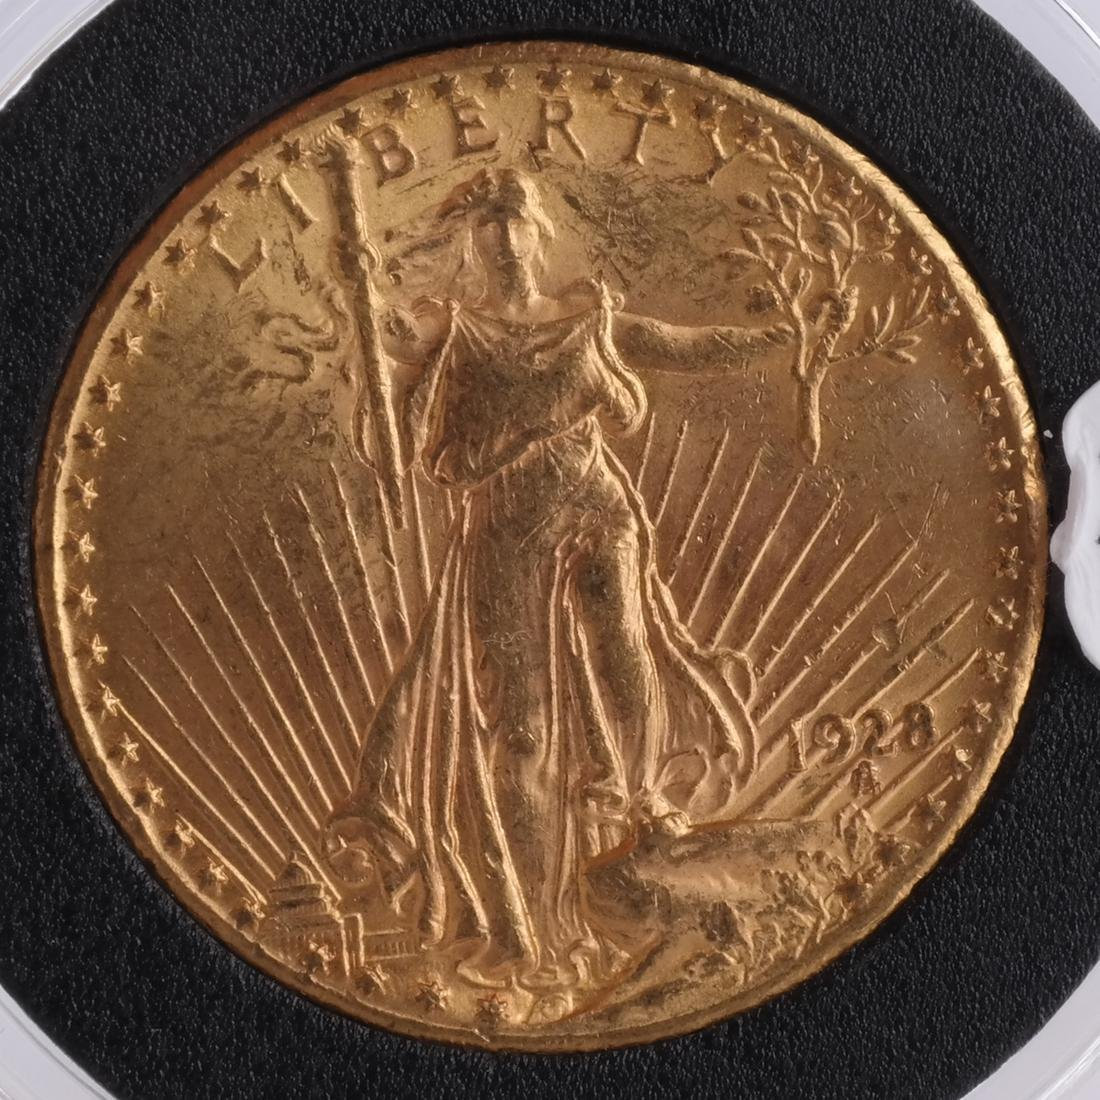 1928 $20 Gold Saint Gaudens, MS 63